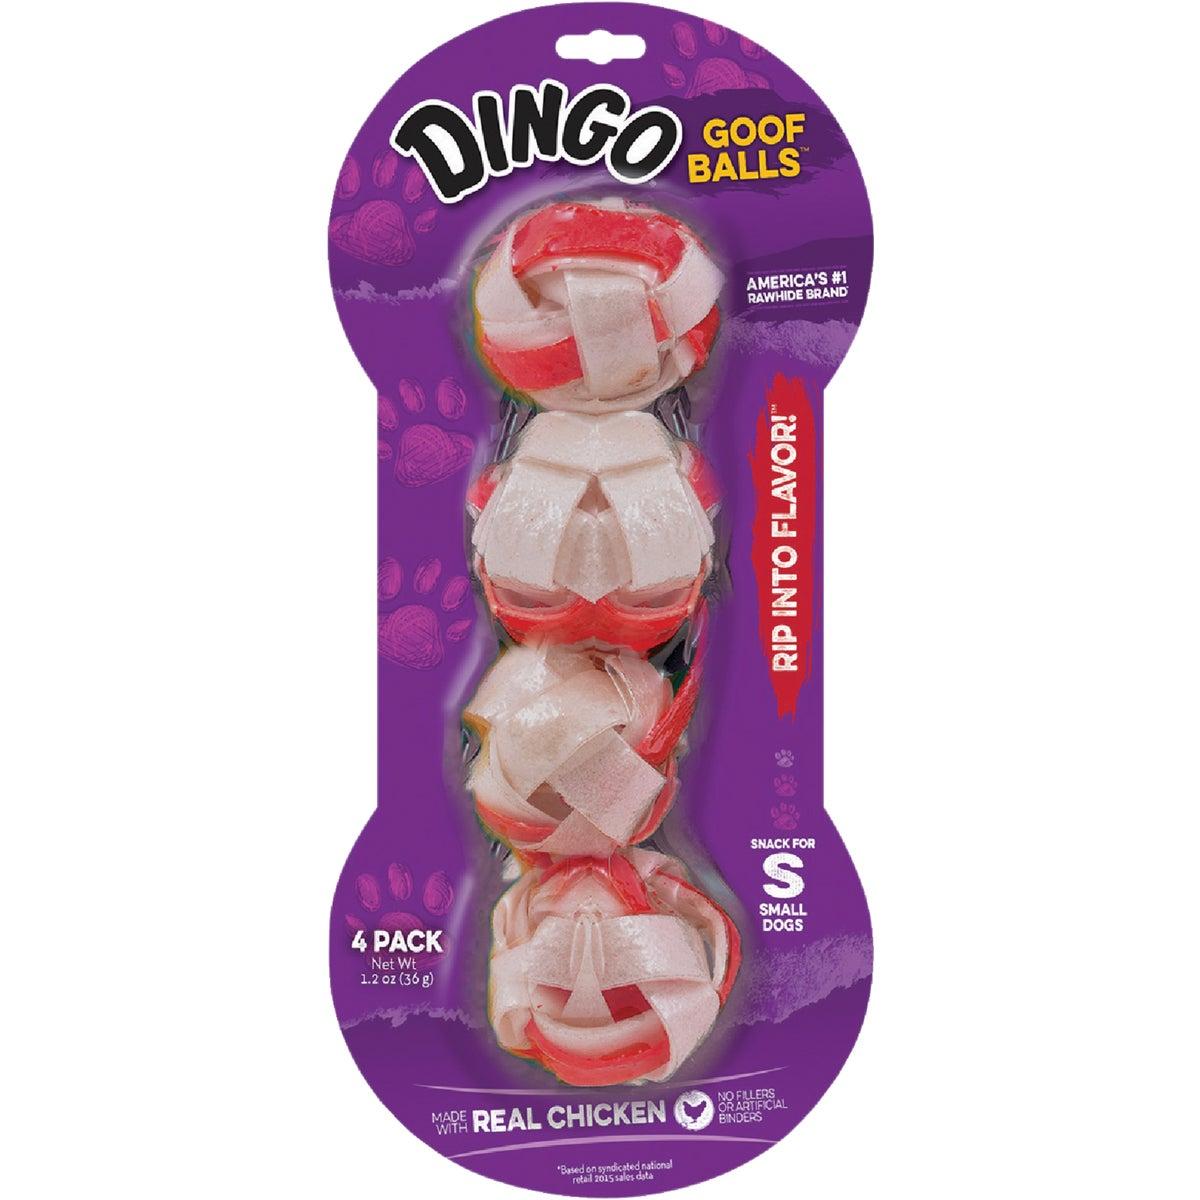 4PK SML DINGO GOOF BALLS - 30040 by United Pet Group